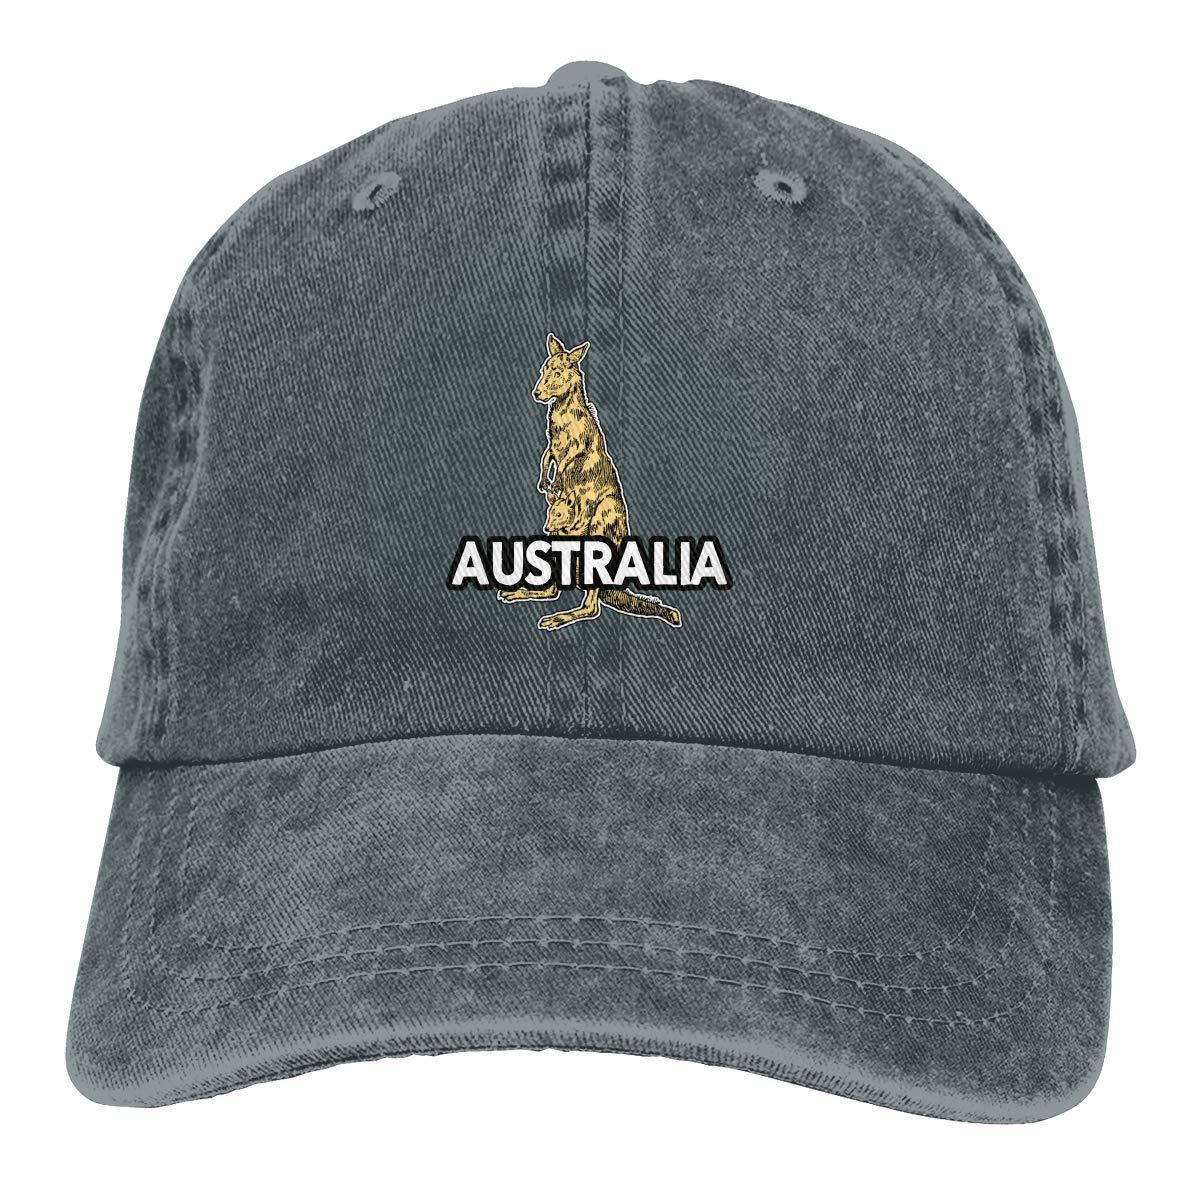 Unisex Adults Vintage Washed Baseball Cap Adjustable Dad Hat - Australian Kangaroo Black